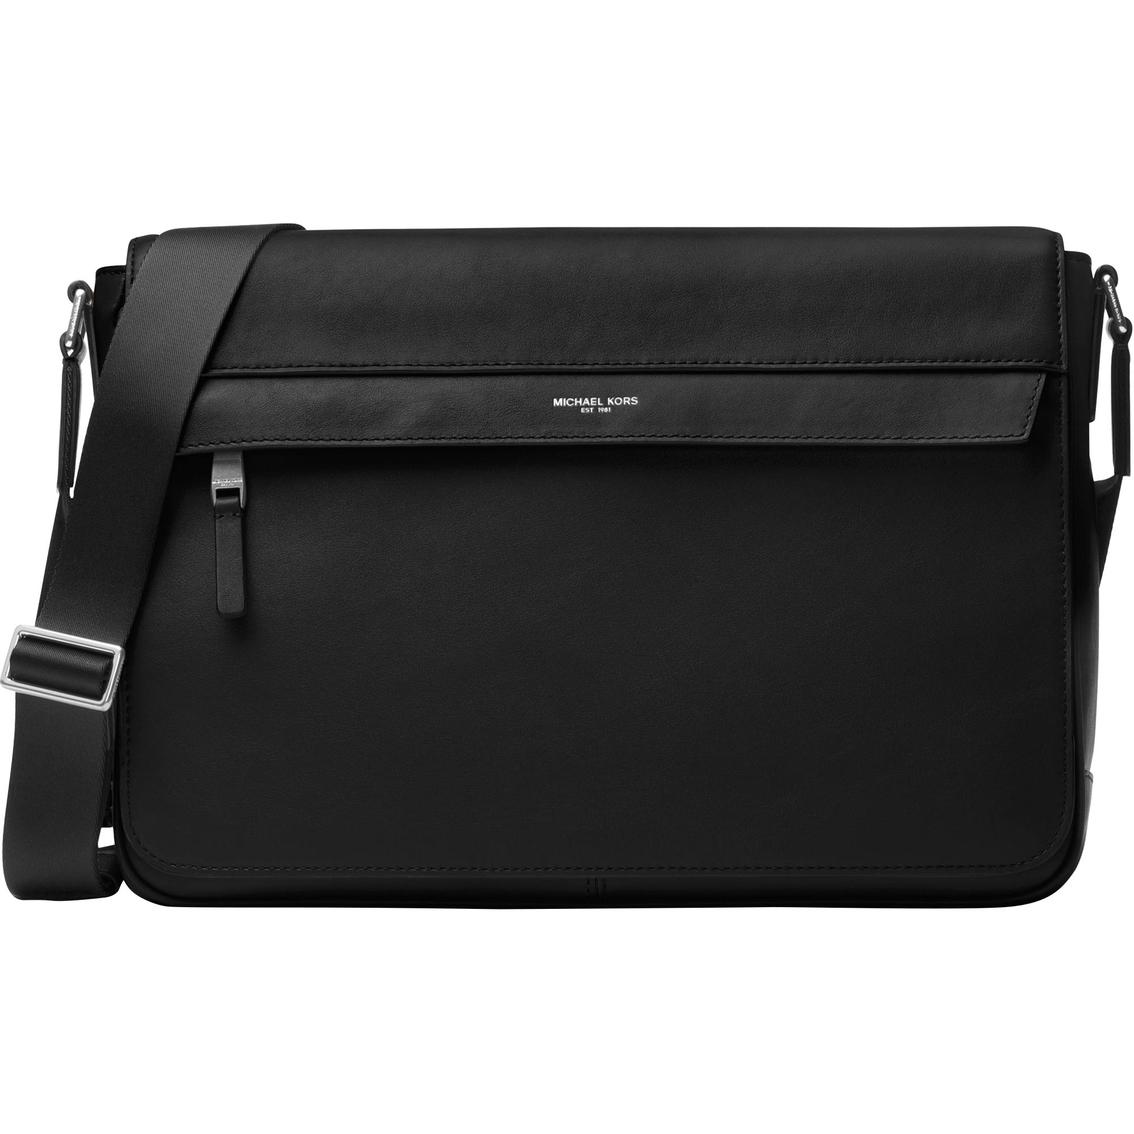 a015d8125c7c Michael Kors Odin Resina Large Messenger Bag | Accessories | Shop ...